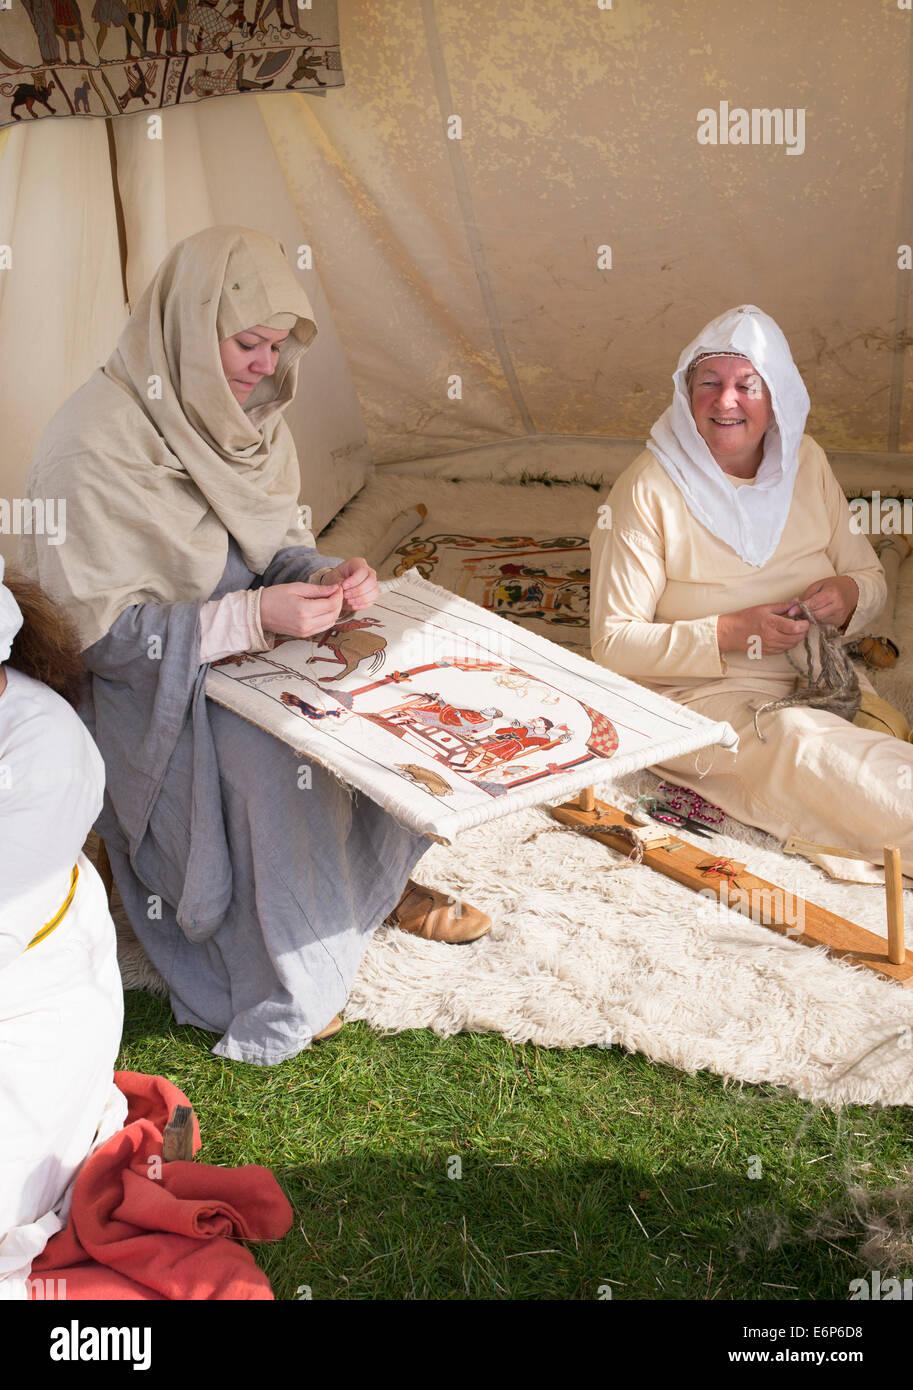 Viking women making a Tapestry at a historical reenactment. UK - Stock Image